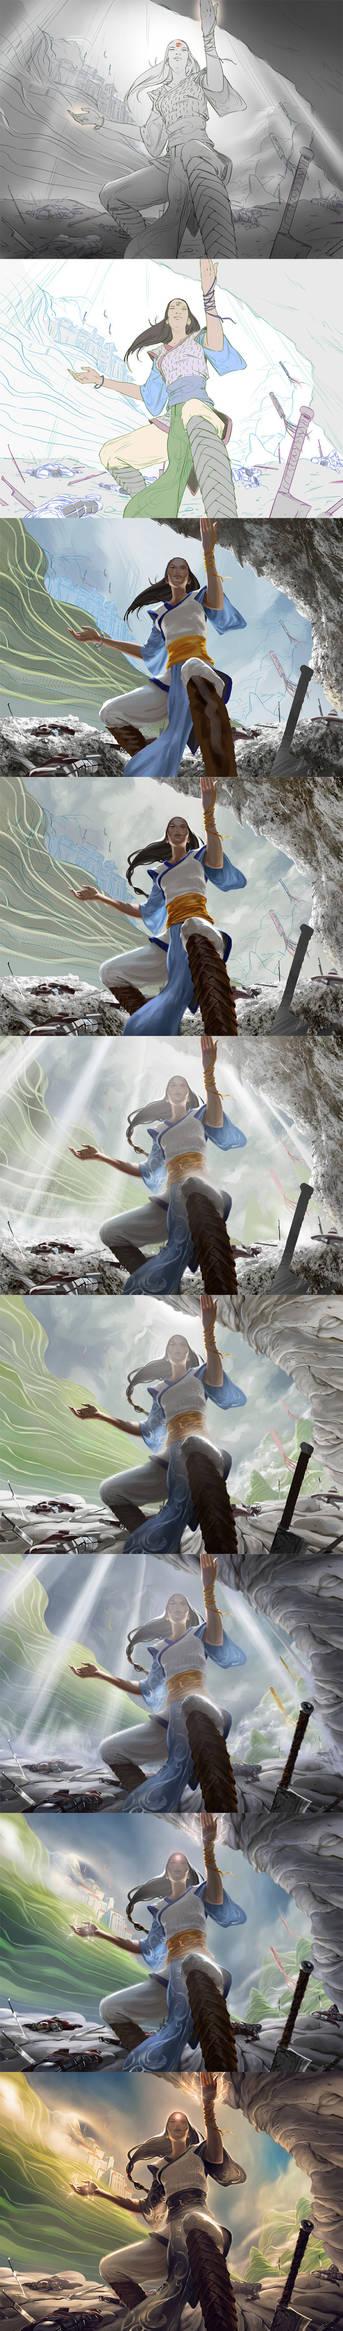 Soulfire Grand Master - steps